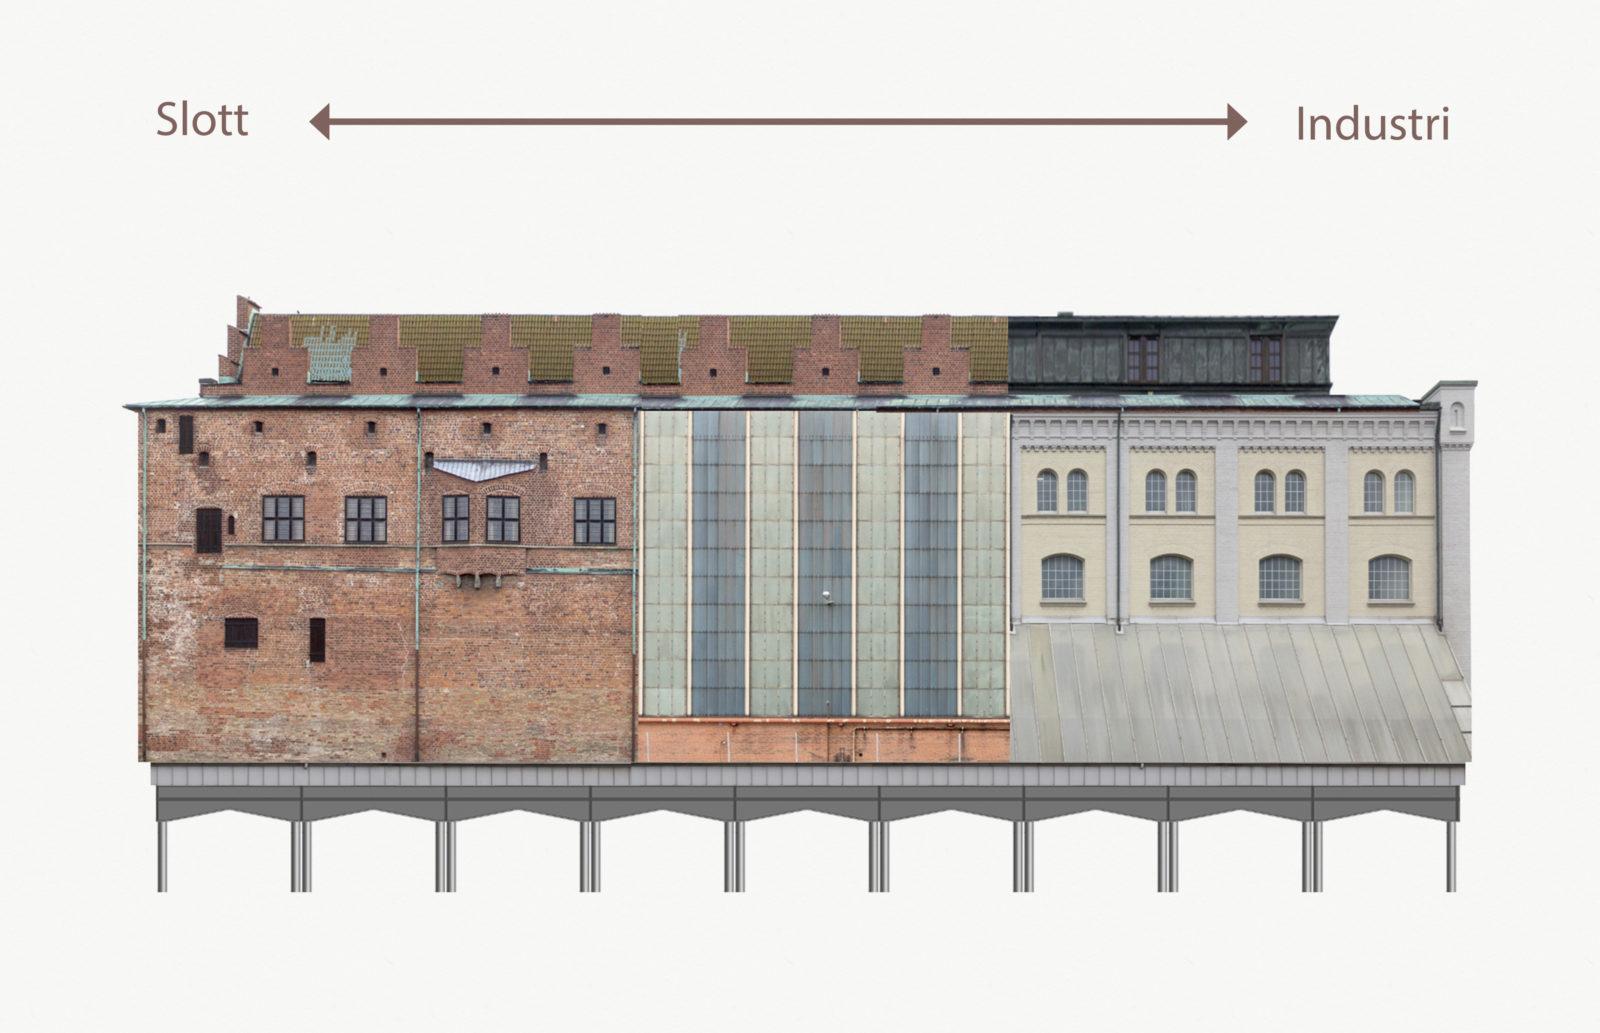 KjellanderSjoberg Citadellskajen Fasaddiagram 3600x2324px